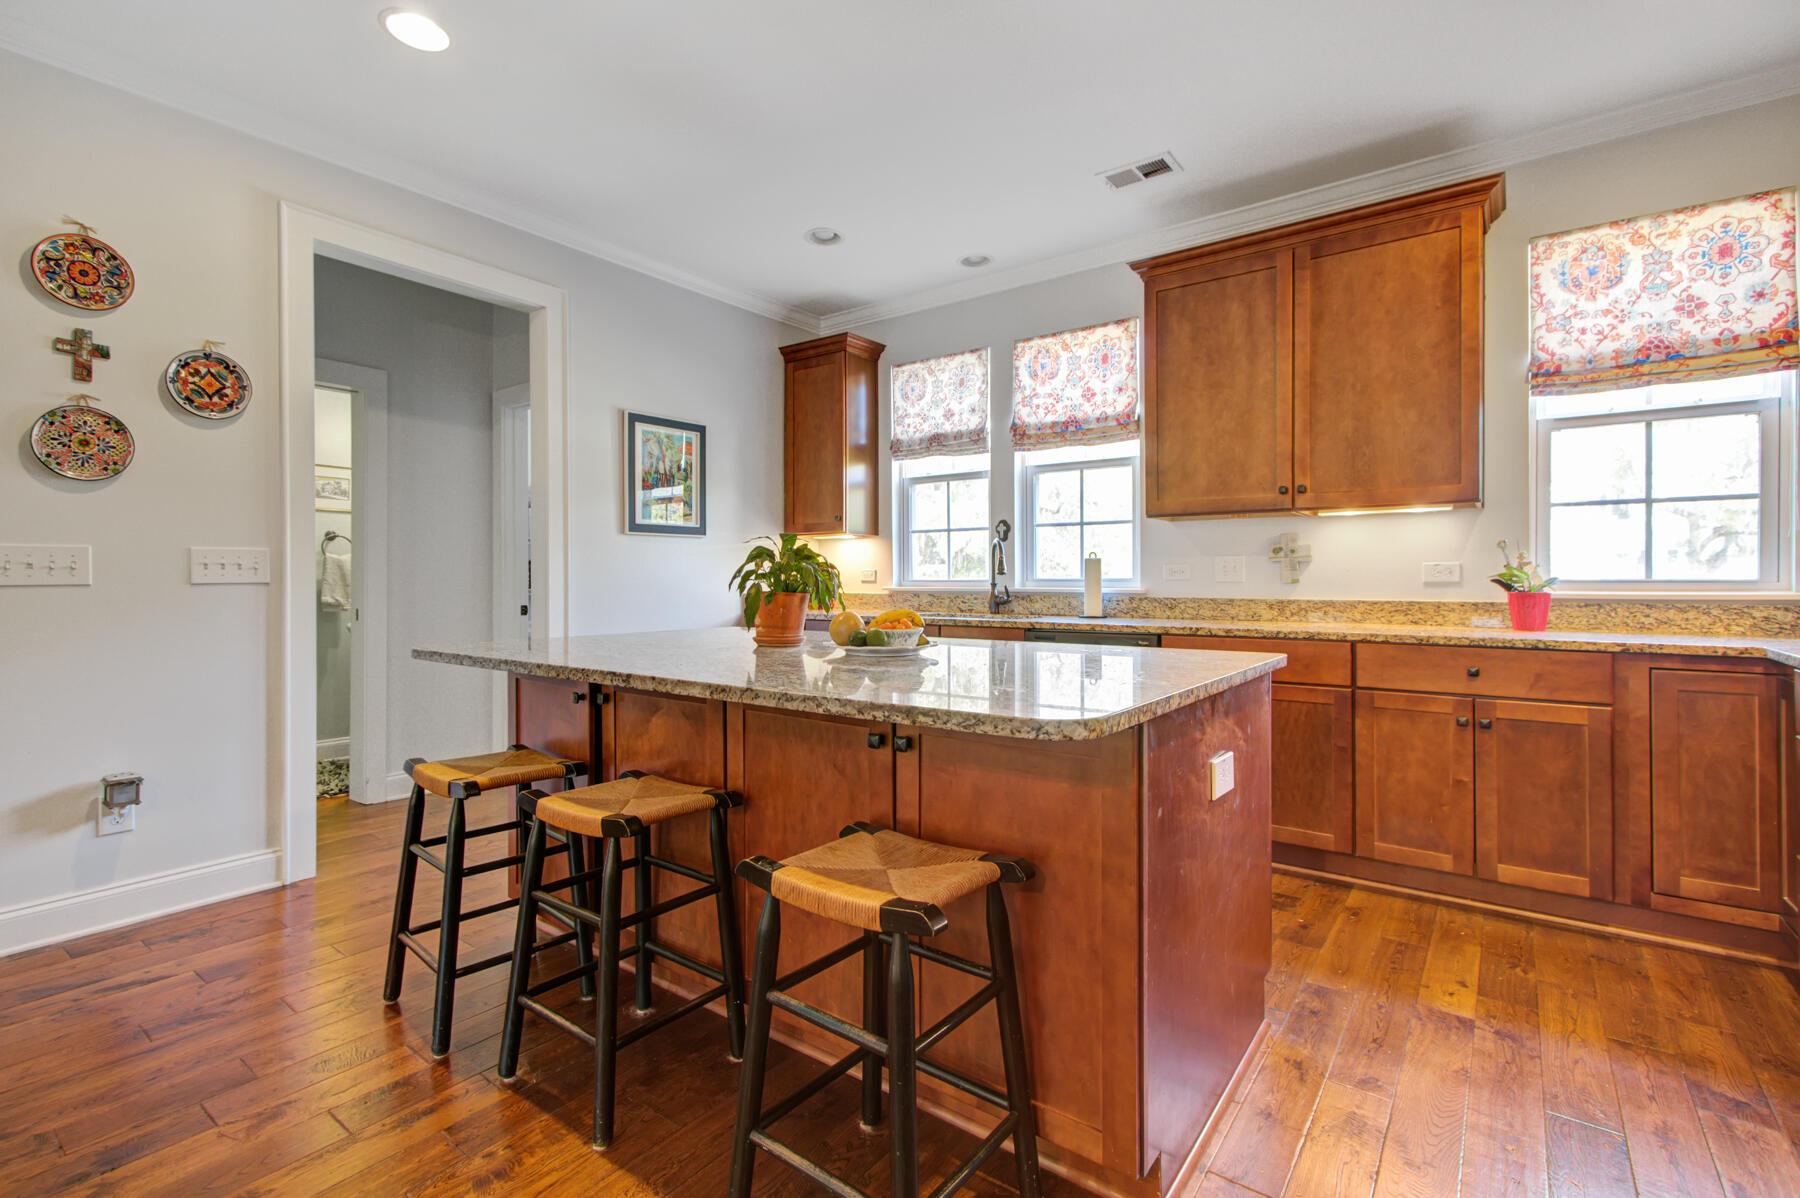 Etiwan Pointe Homes For Sale - 254 Slipper Shell, Mount Pleasant, SC - 16